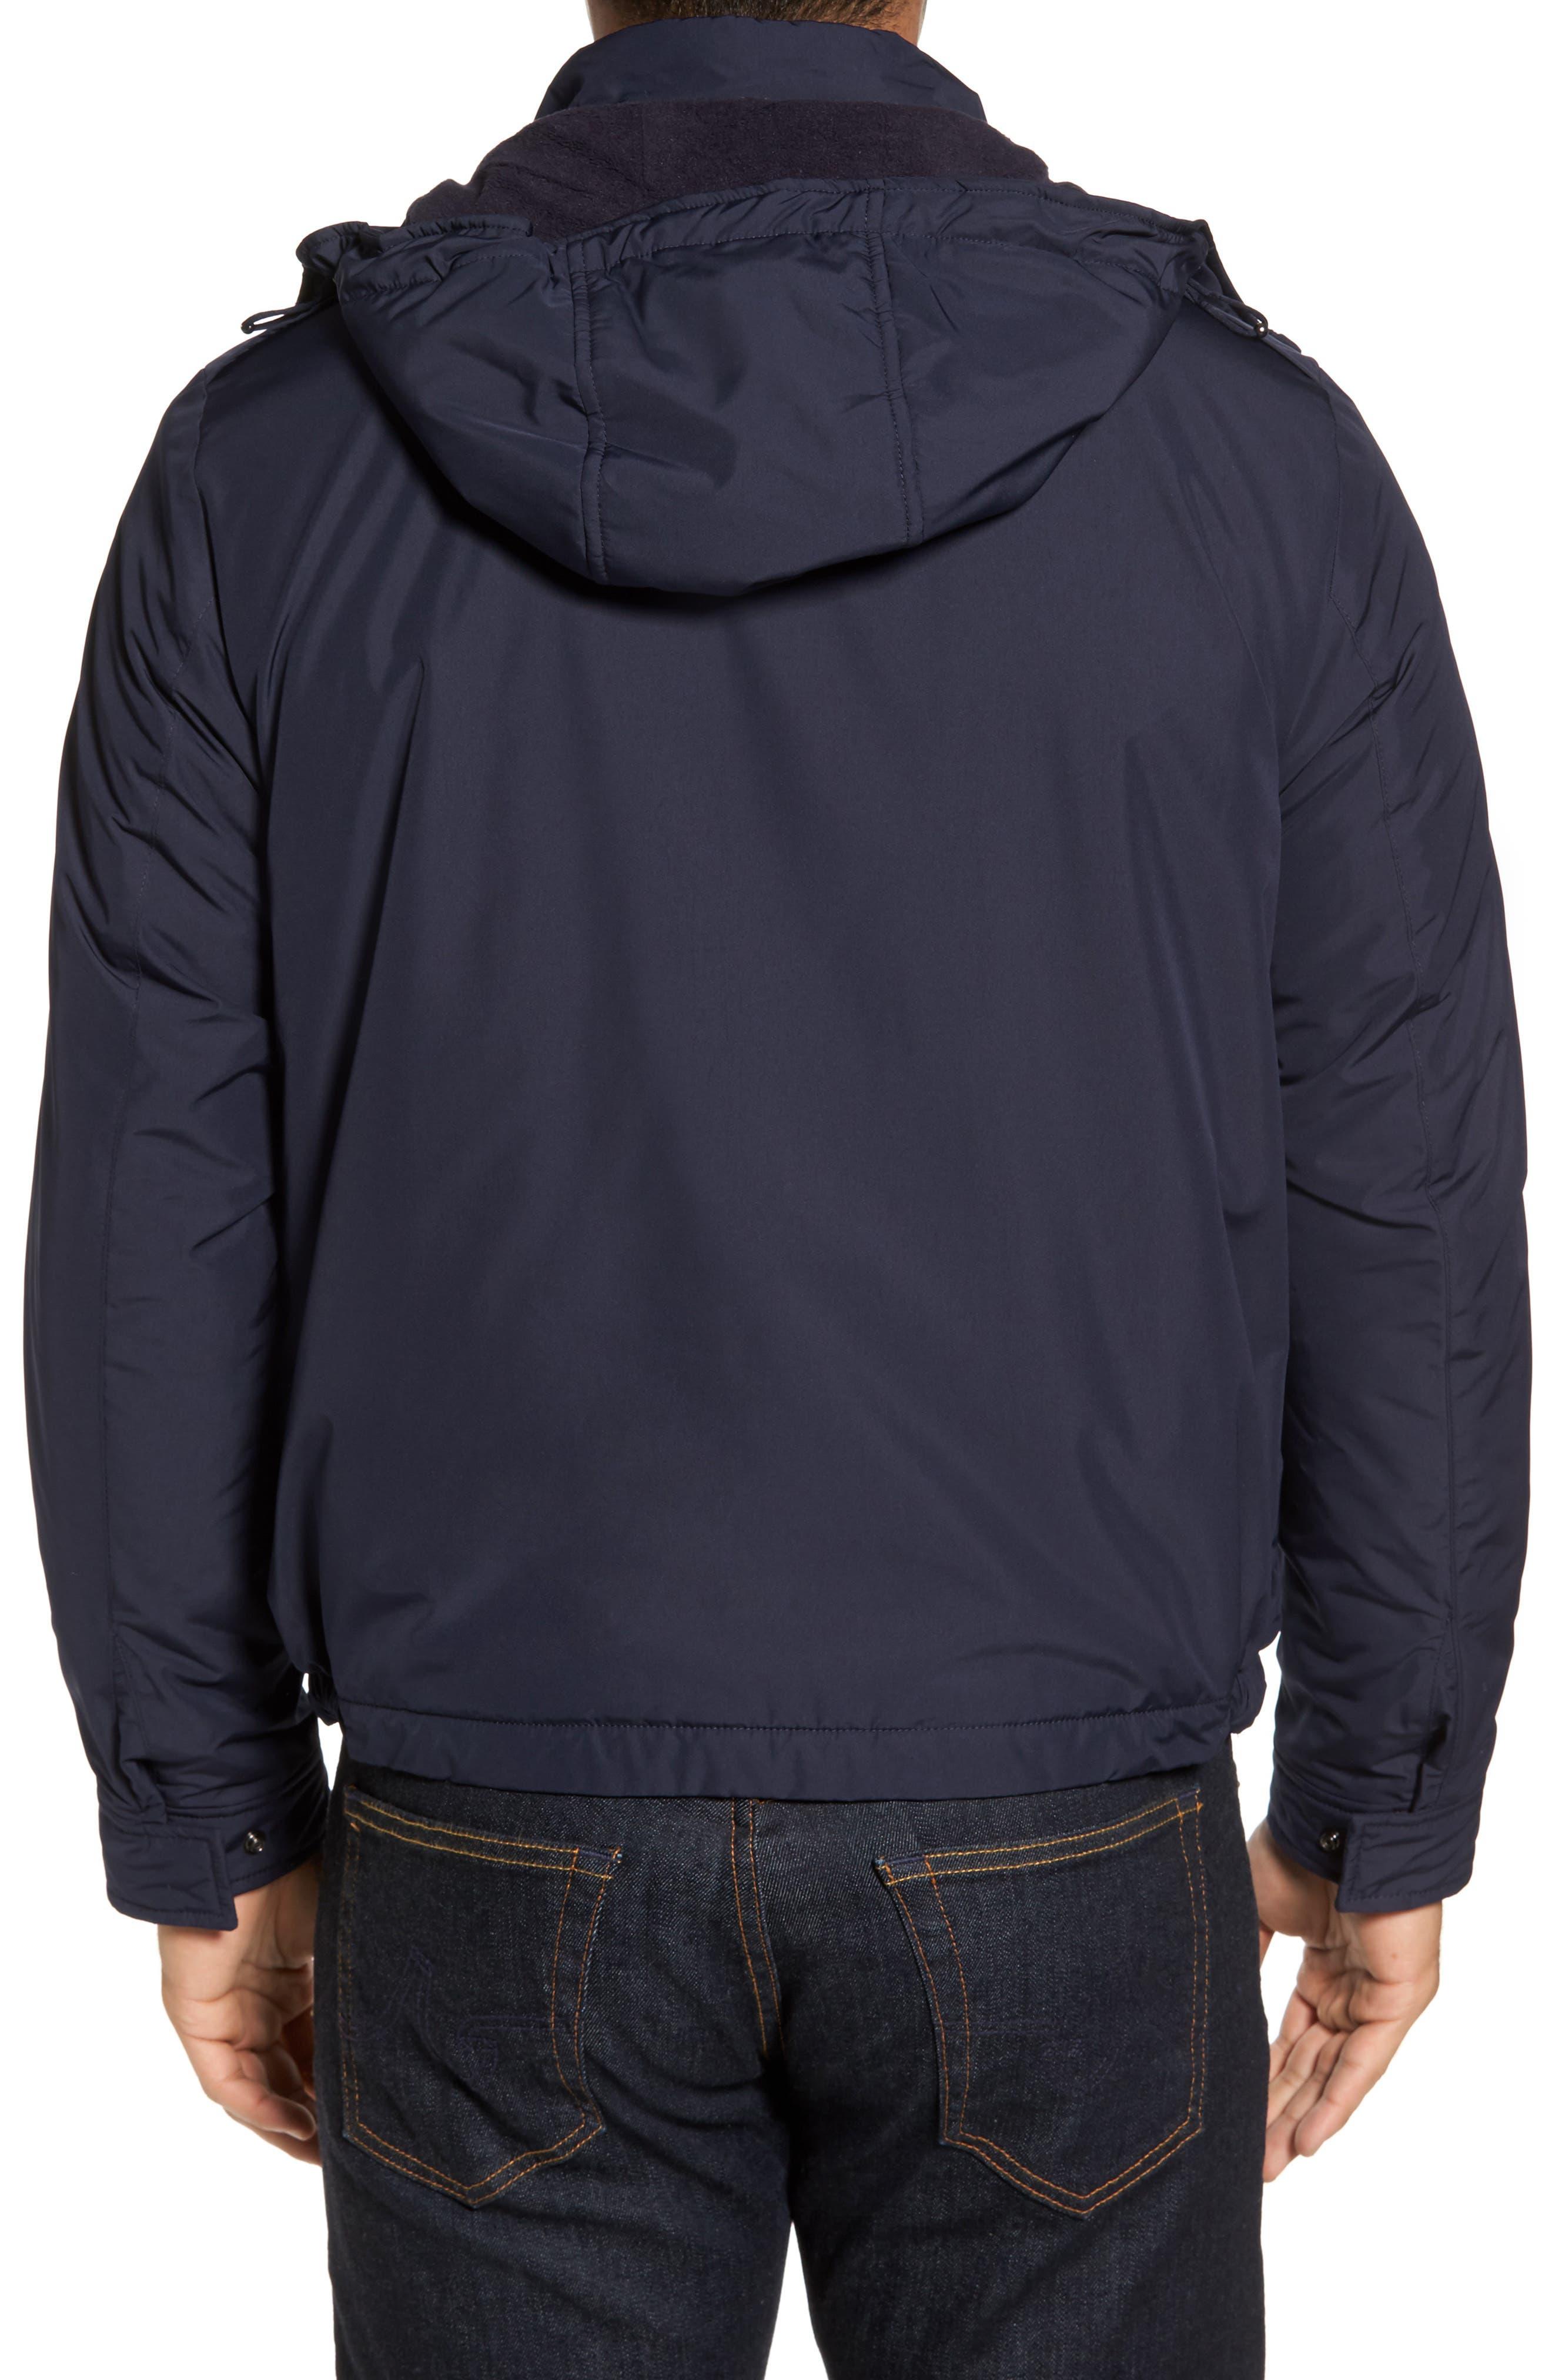 Paul&Shark Fleece Lined Hooded Jacket,                             Alternate thumbnail 2, color,                             400